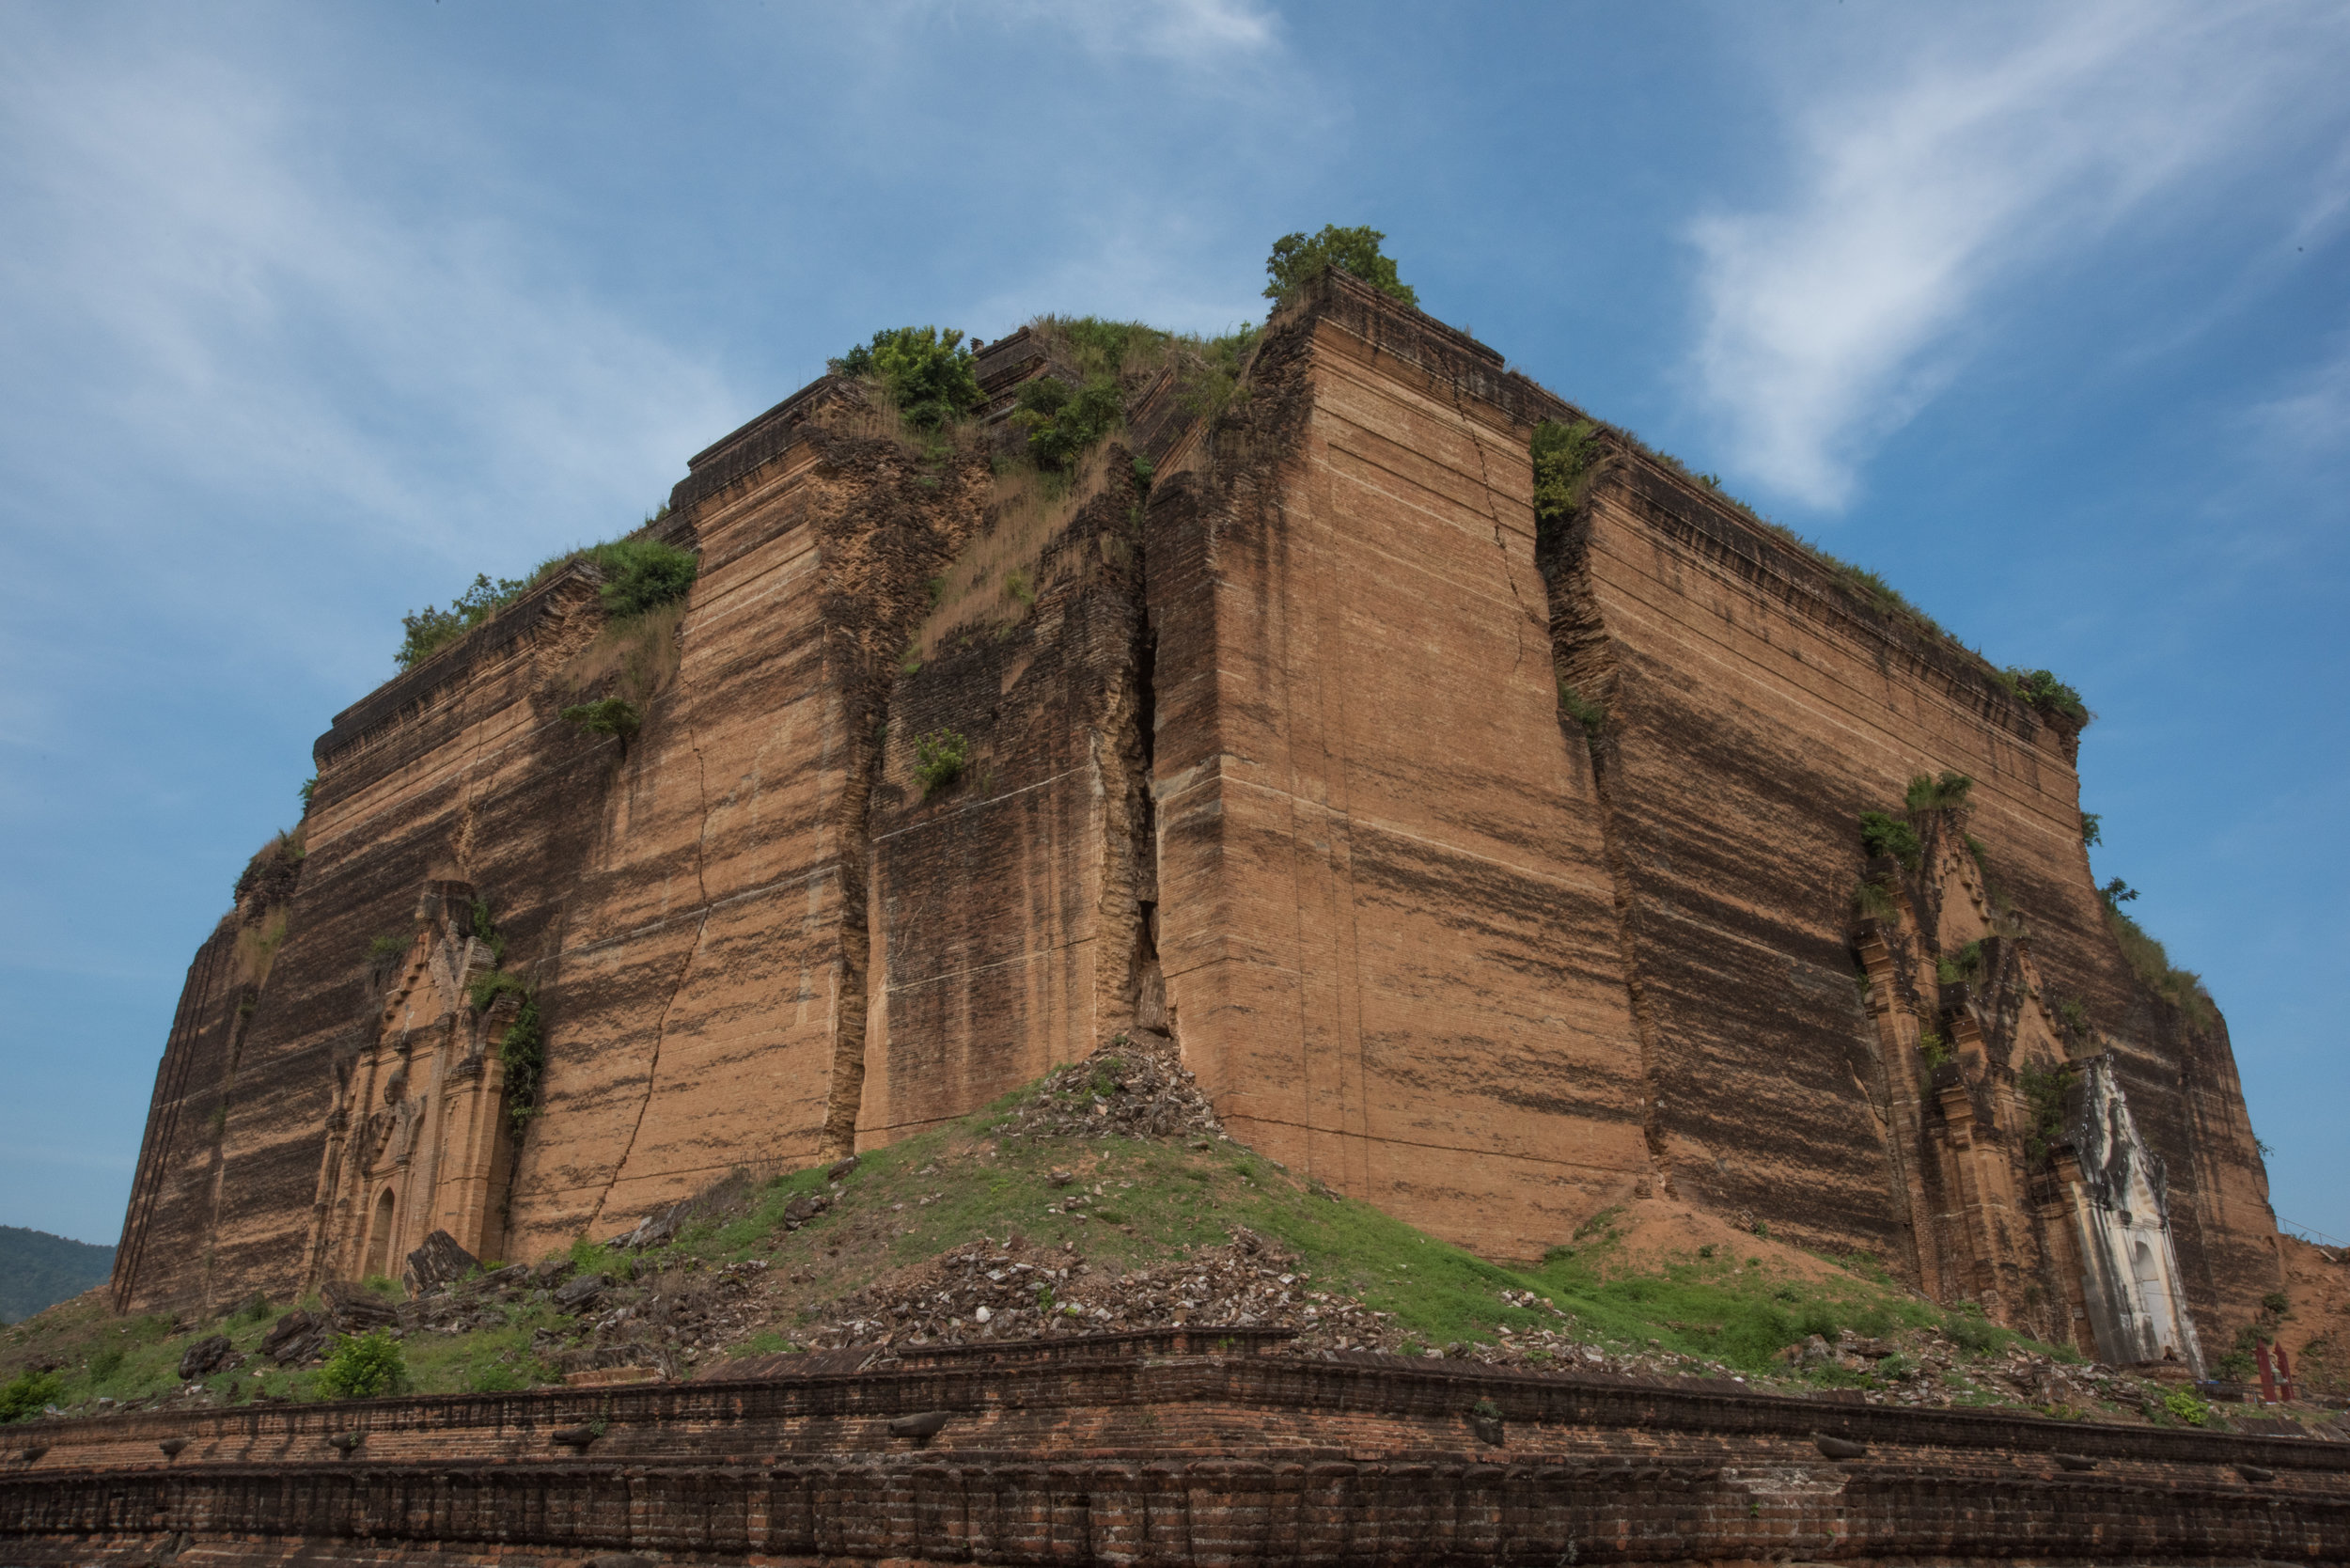 Unfinished Pagoda, Mingun, Myanmar